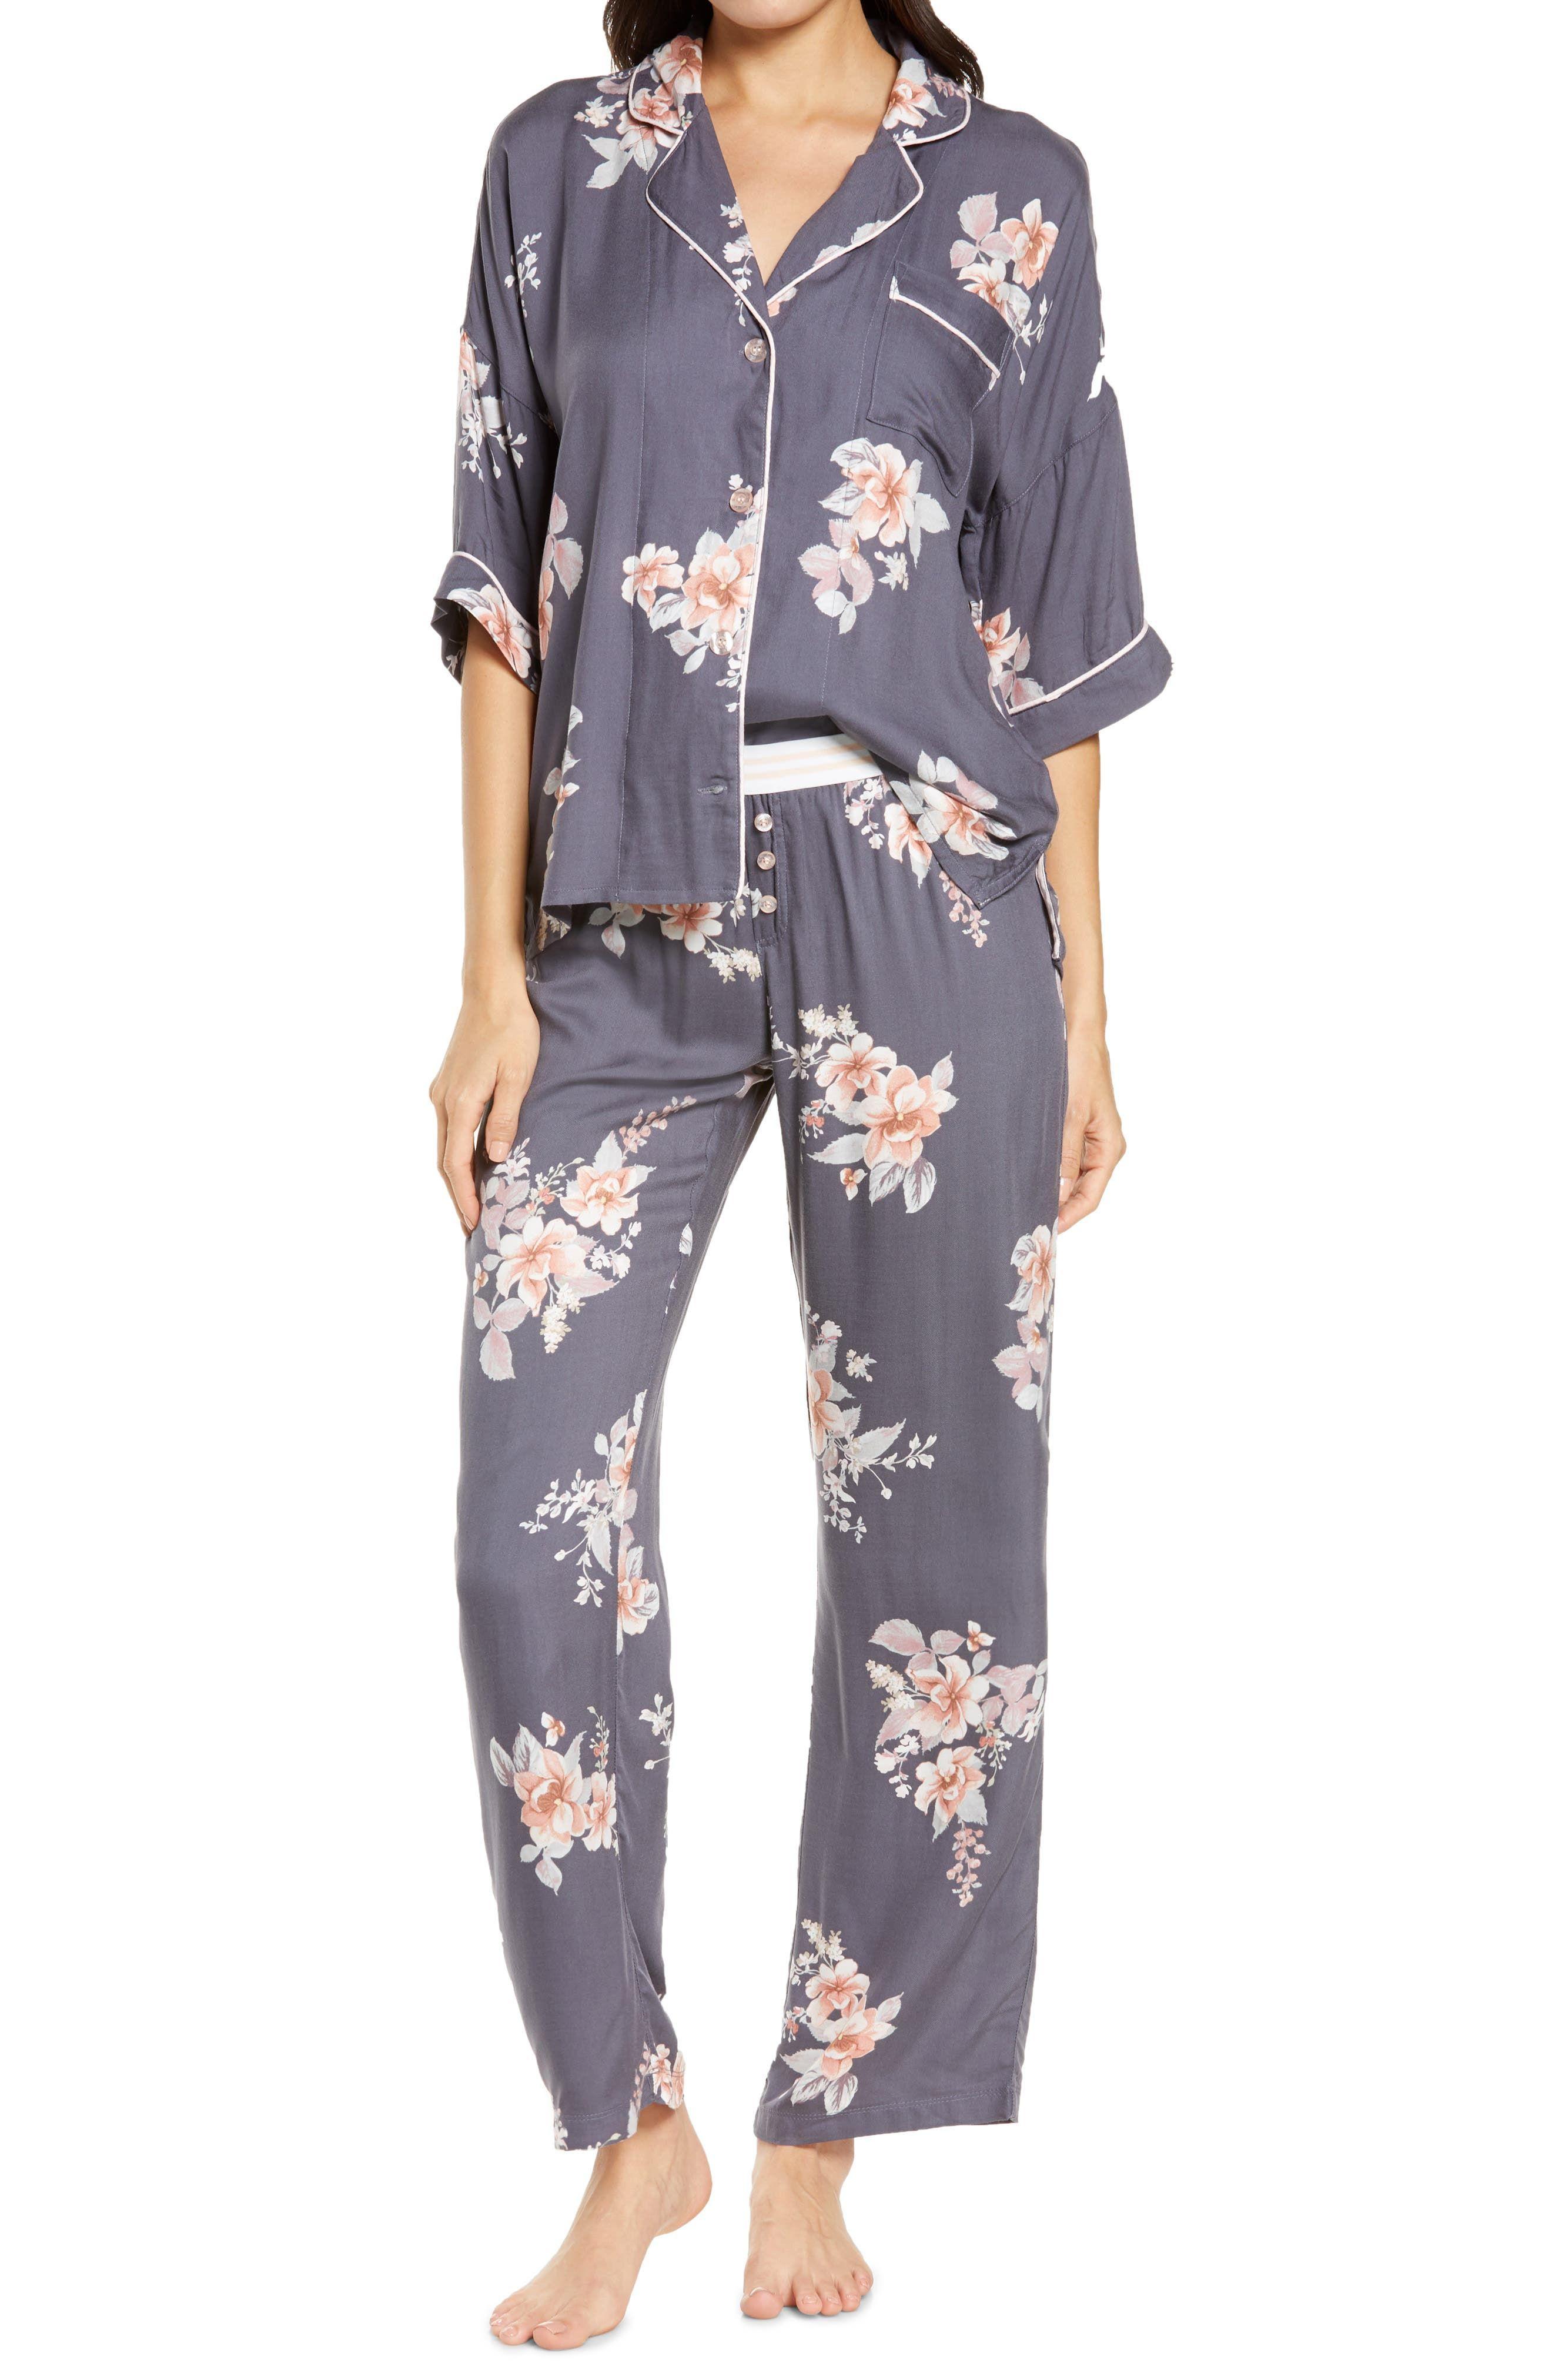 PJ Salvage Cotton Flannel Pajama Shirt//Pants Set Party Time Navy